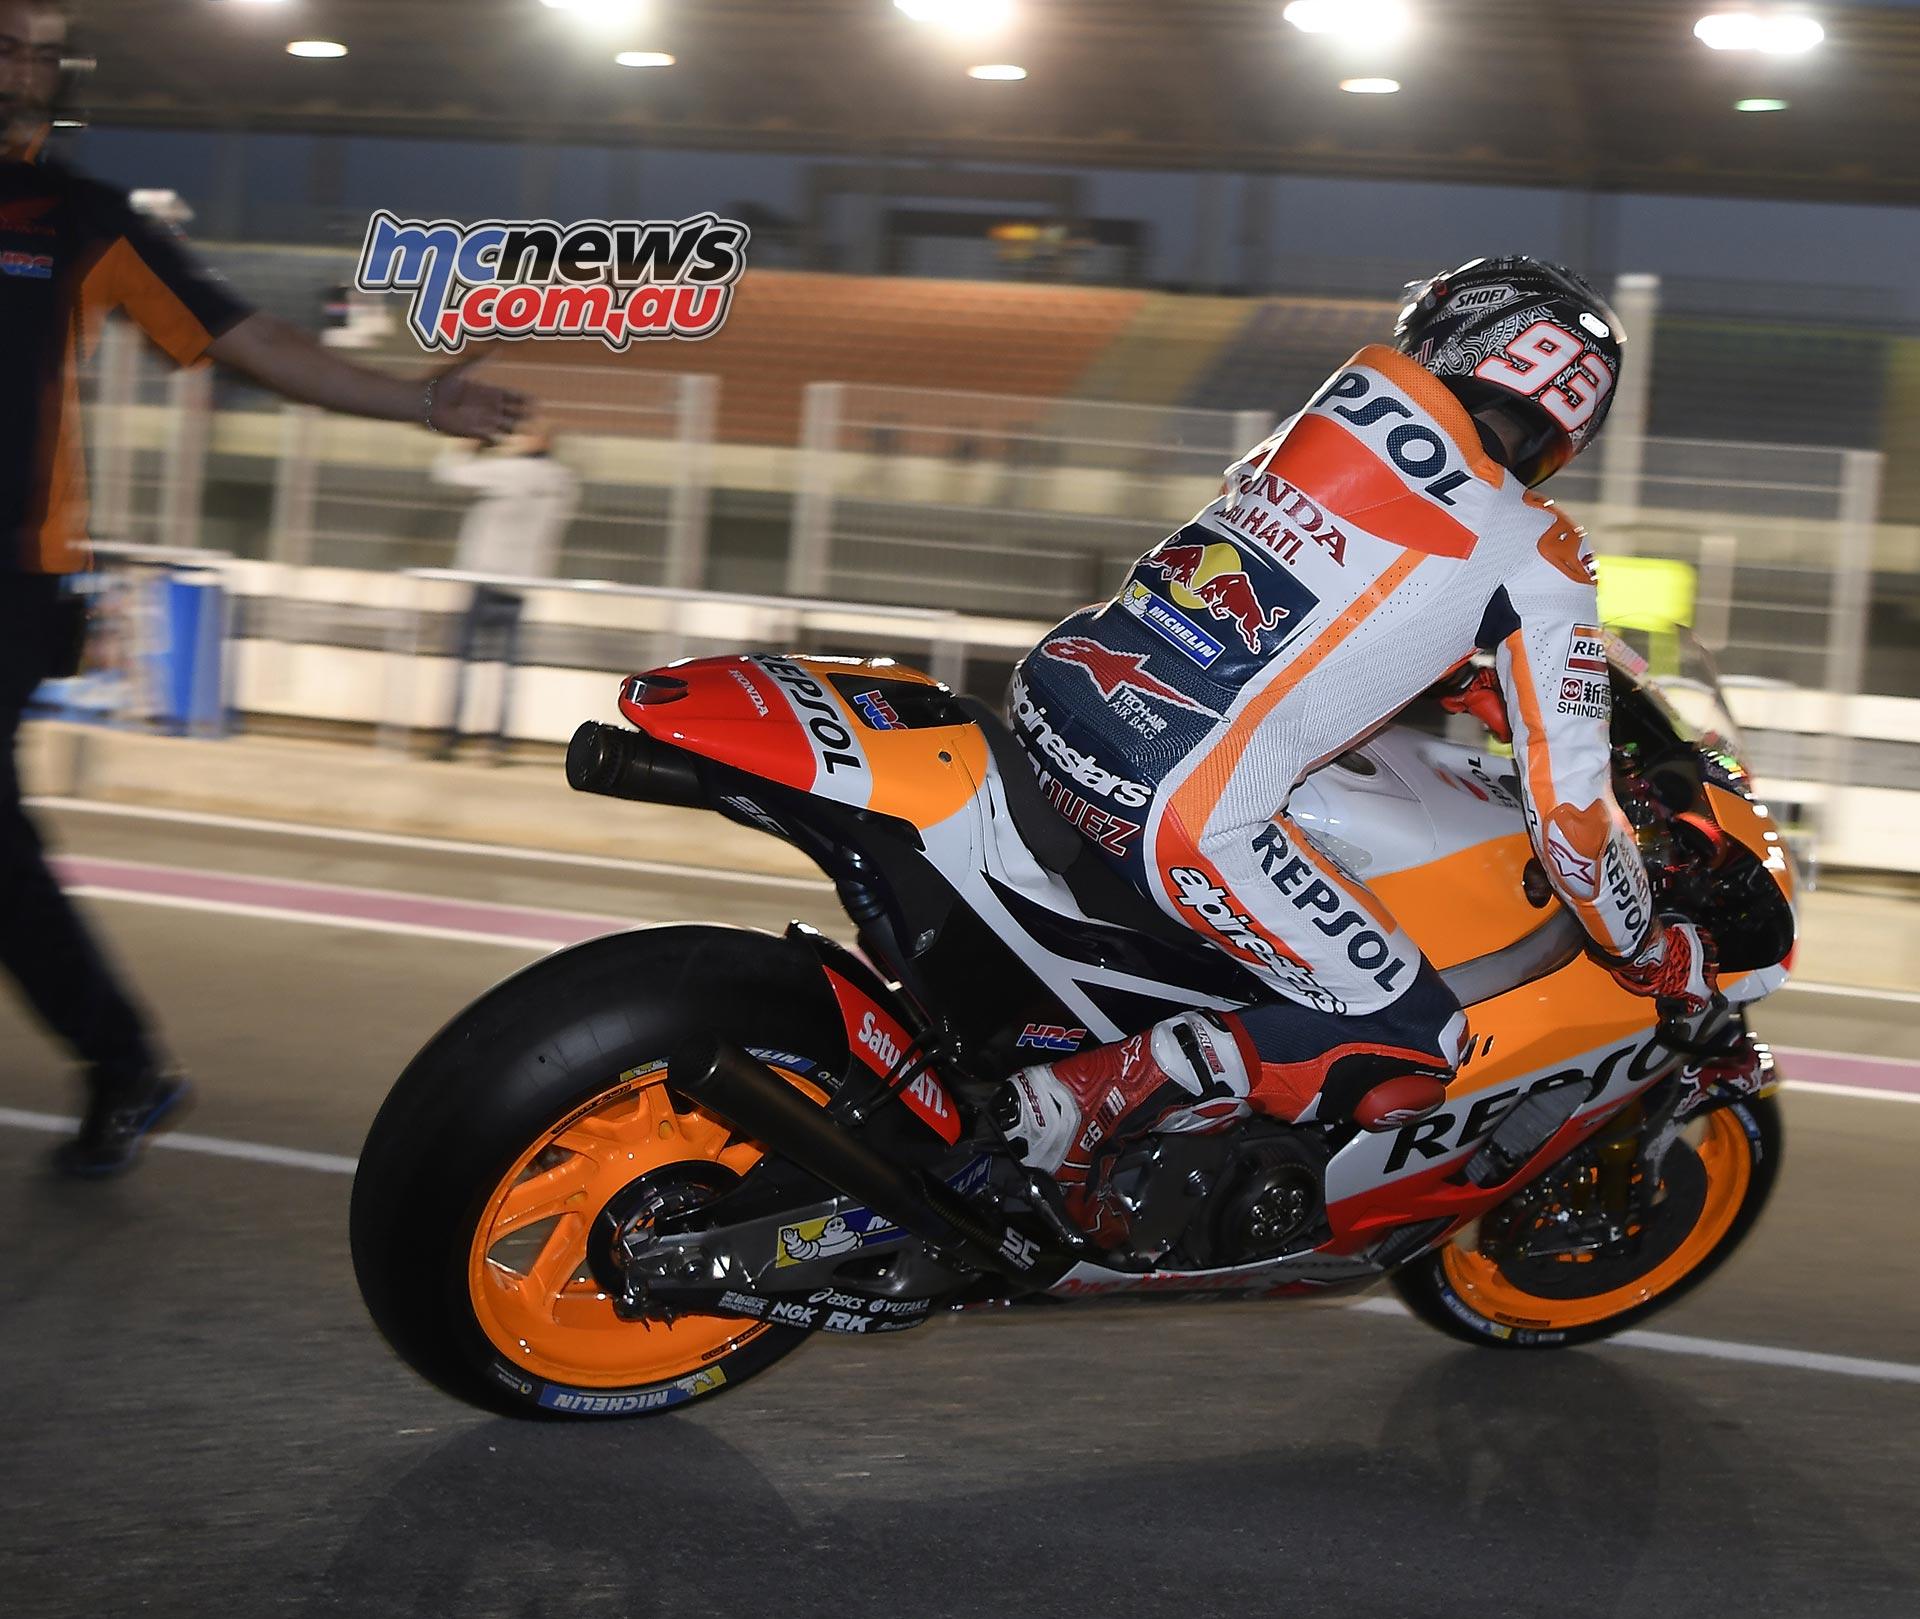 Motogp Qatar Crash | MotoGP 2017 Info, Video, Points Table